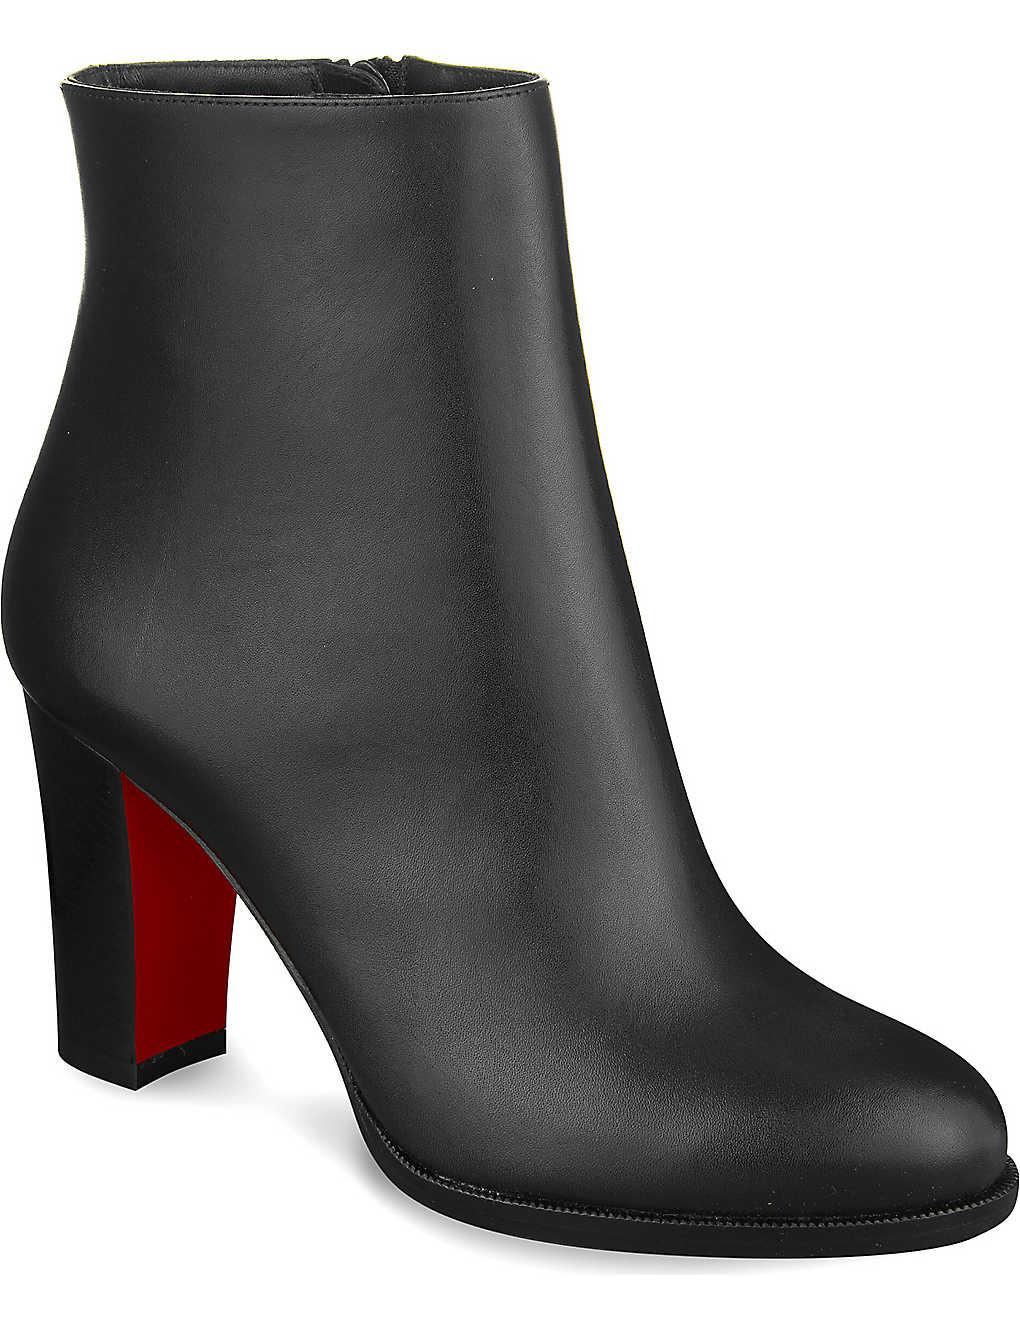 38eb4d9c8f6a CHRISTIAN LOUBOUTIN - Adox 85 calf cuoio heel